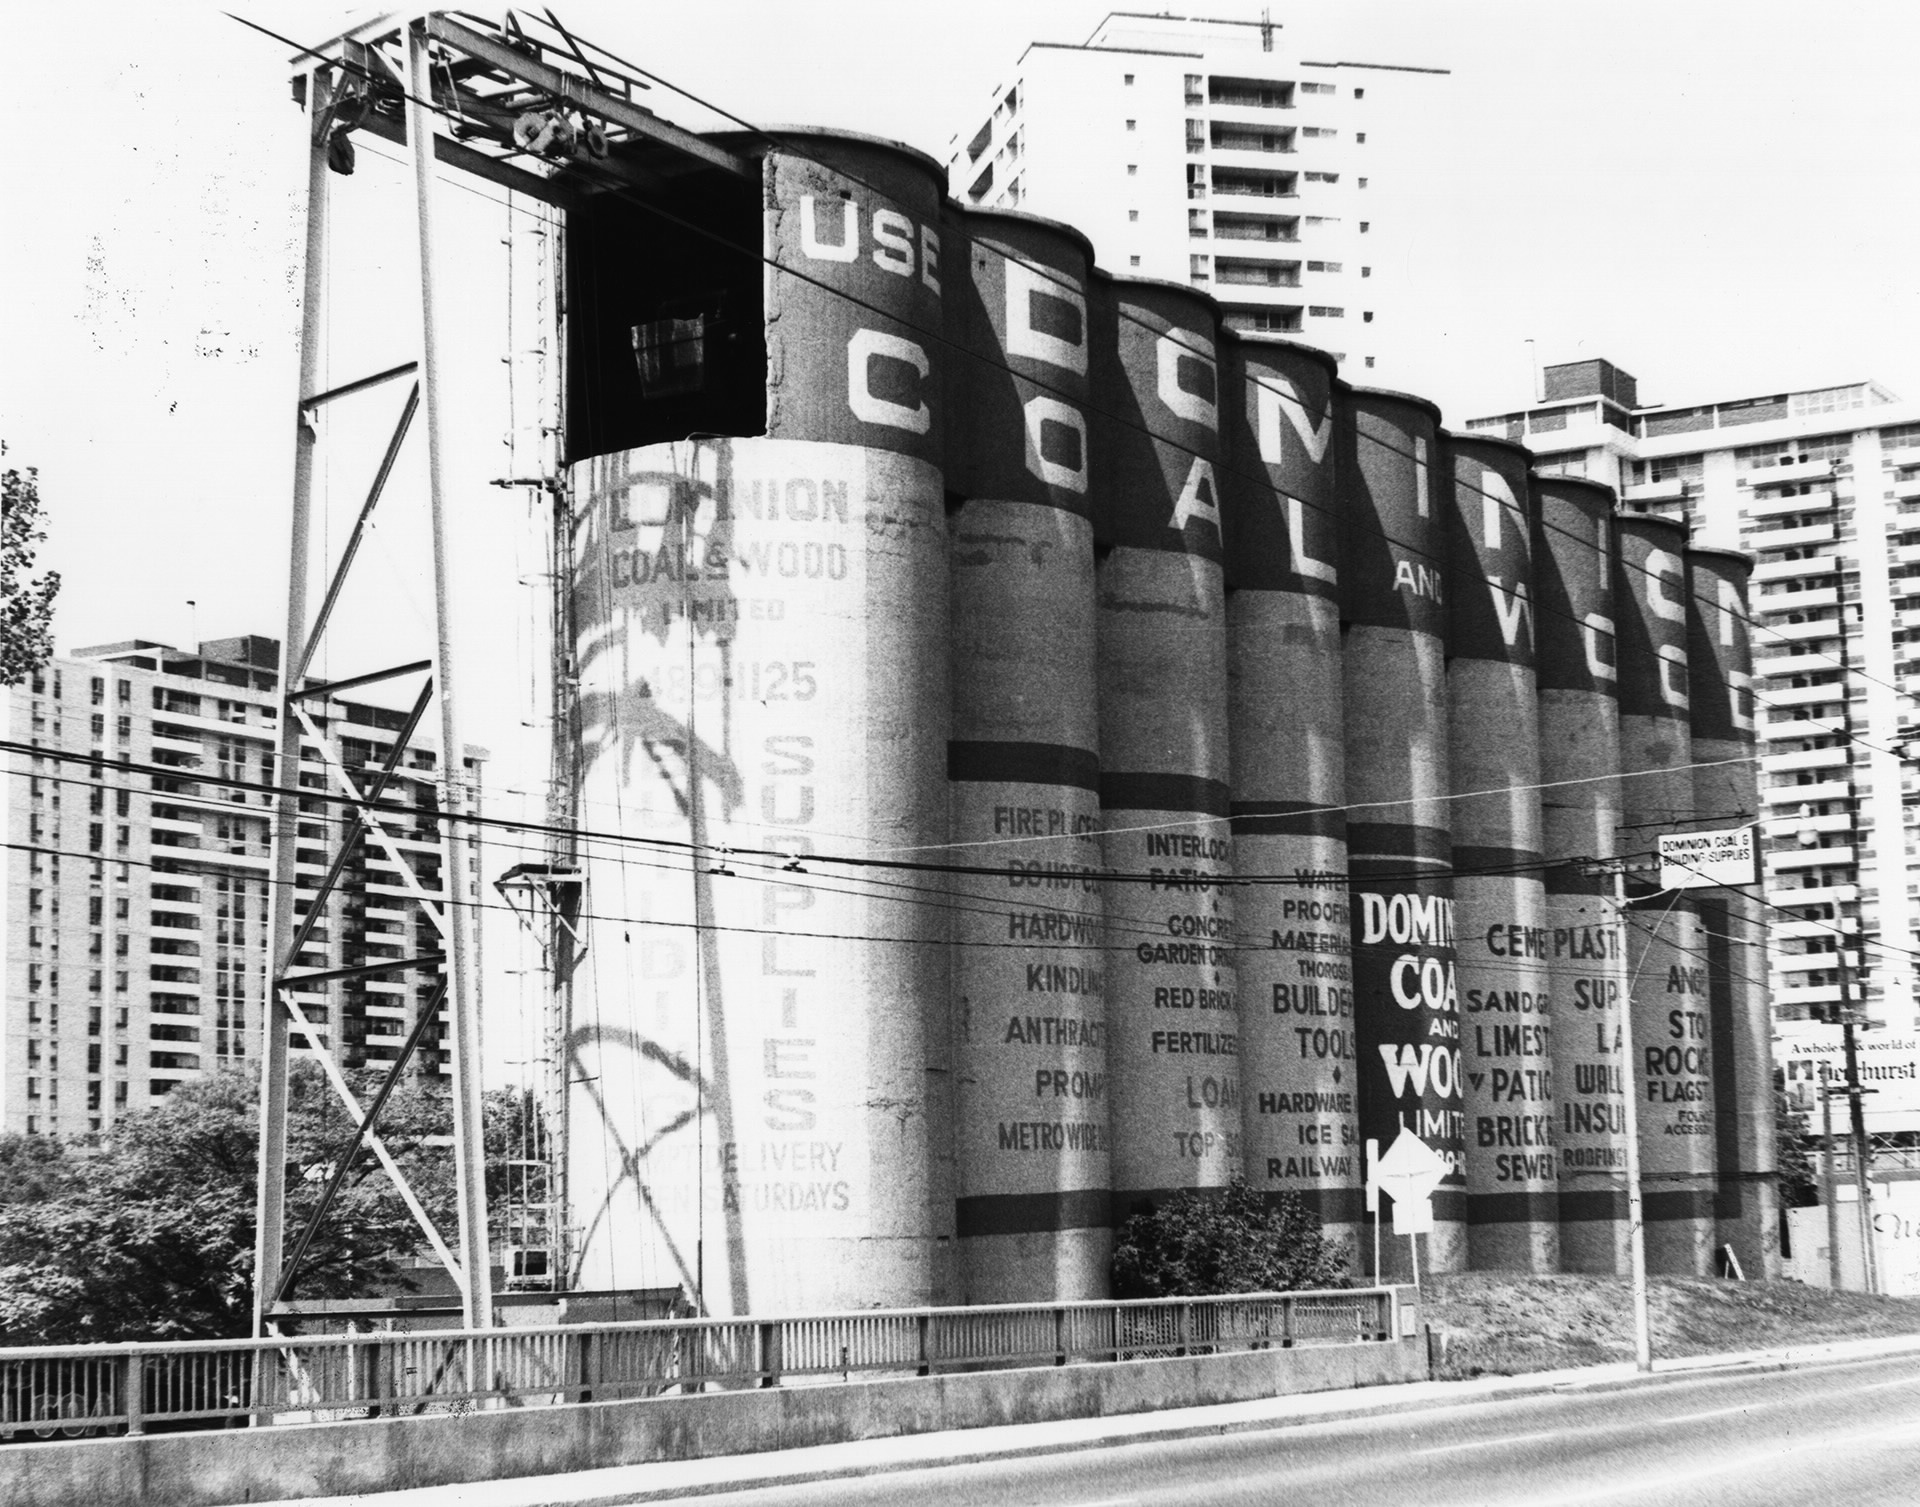 Dominion Coal and Wood Ltd. silos, Merton Street, southwest corner of Mount Pleasant Road, Toronto, Ont Image c/o Toronto Public Library Archives, 1981